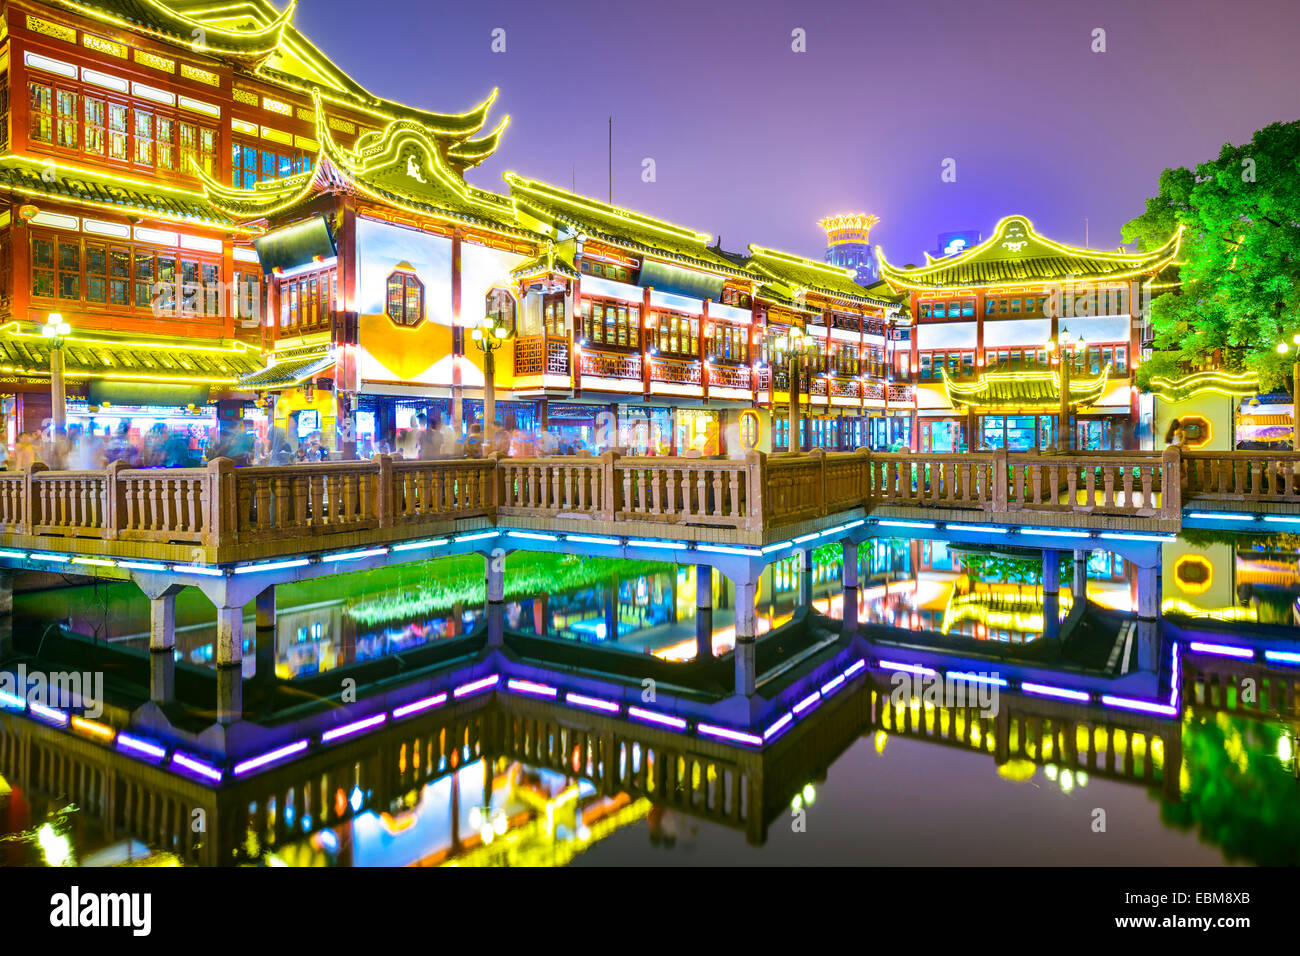 Shanghai, China at Yuyuan Gardens district. - Stock Image